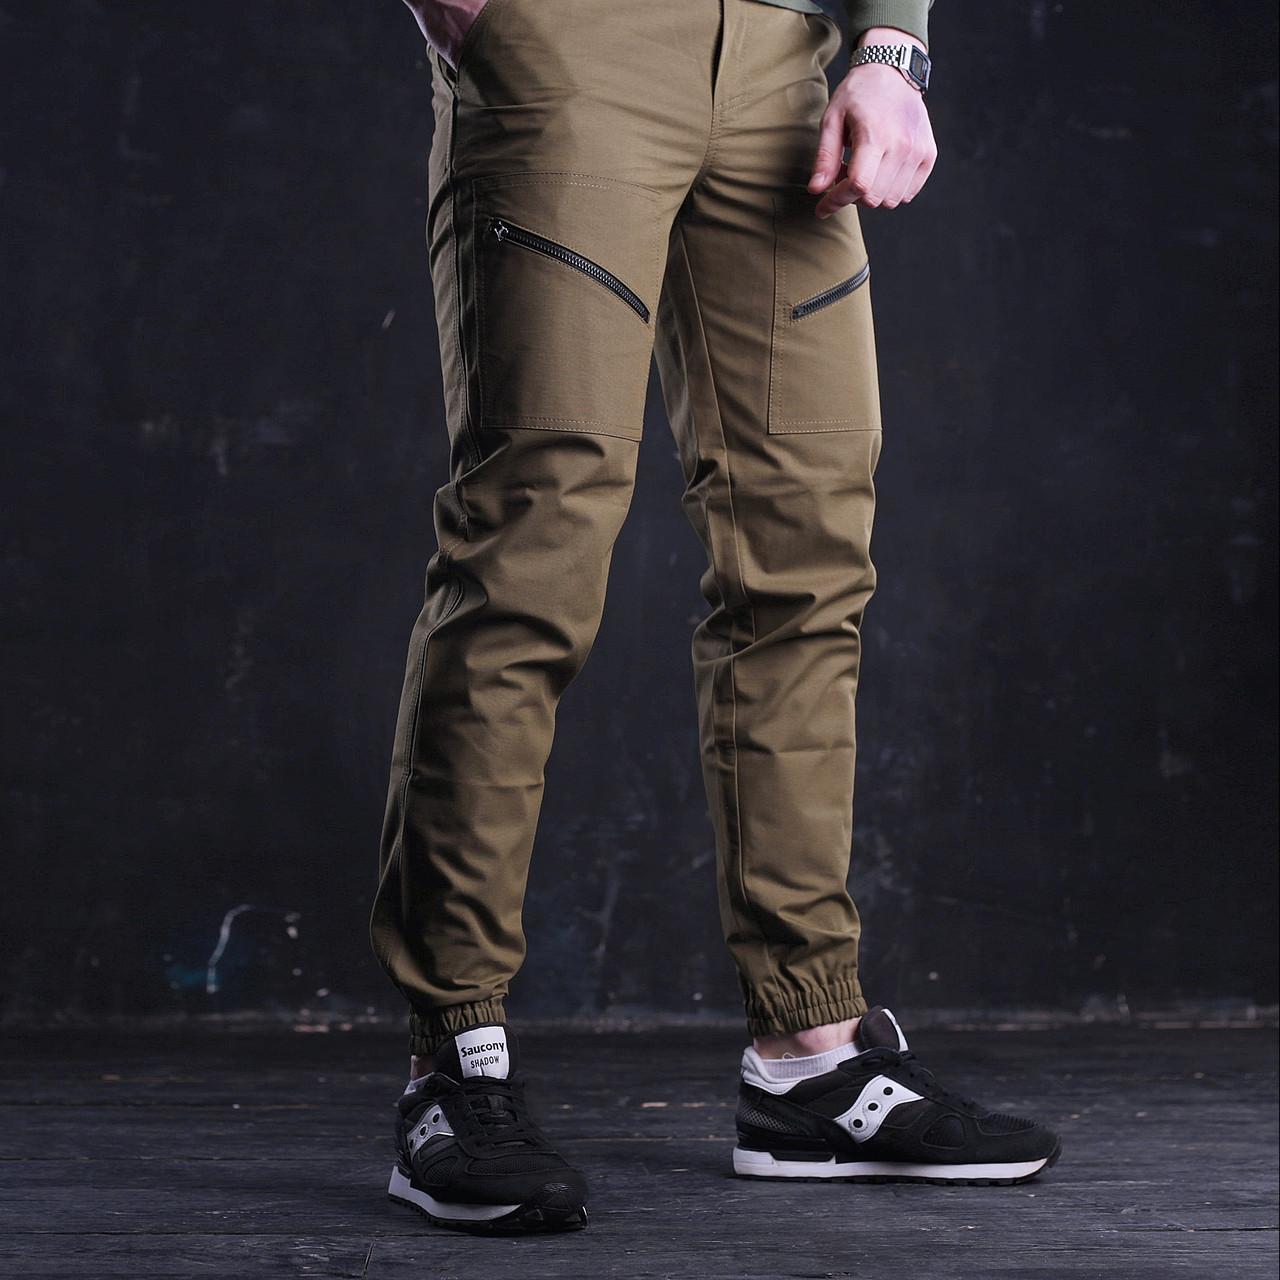 14953729 Карго штаны мужские цвета горка от бренда Тур модель Апачи (Apache) размер  S,